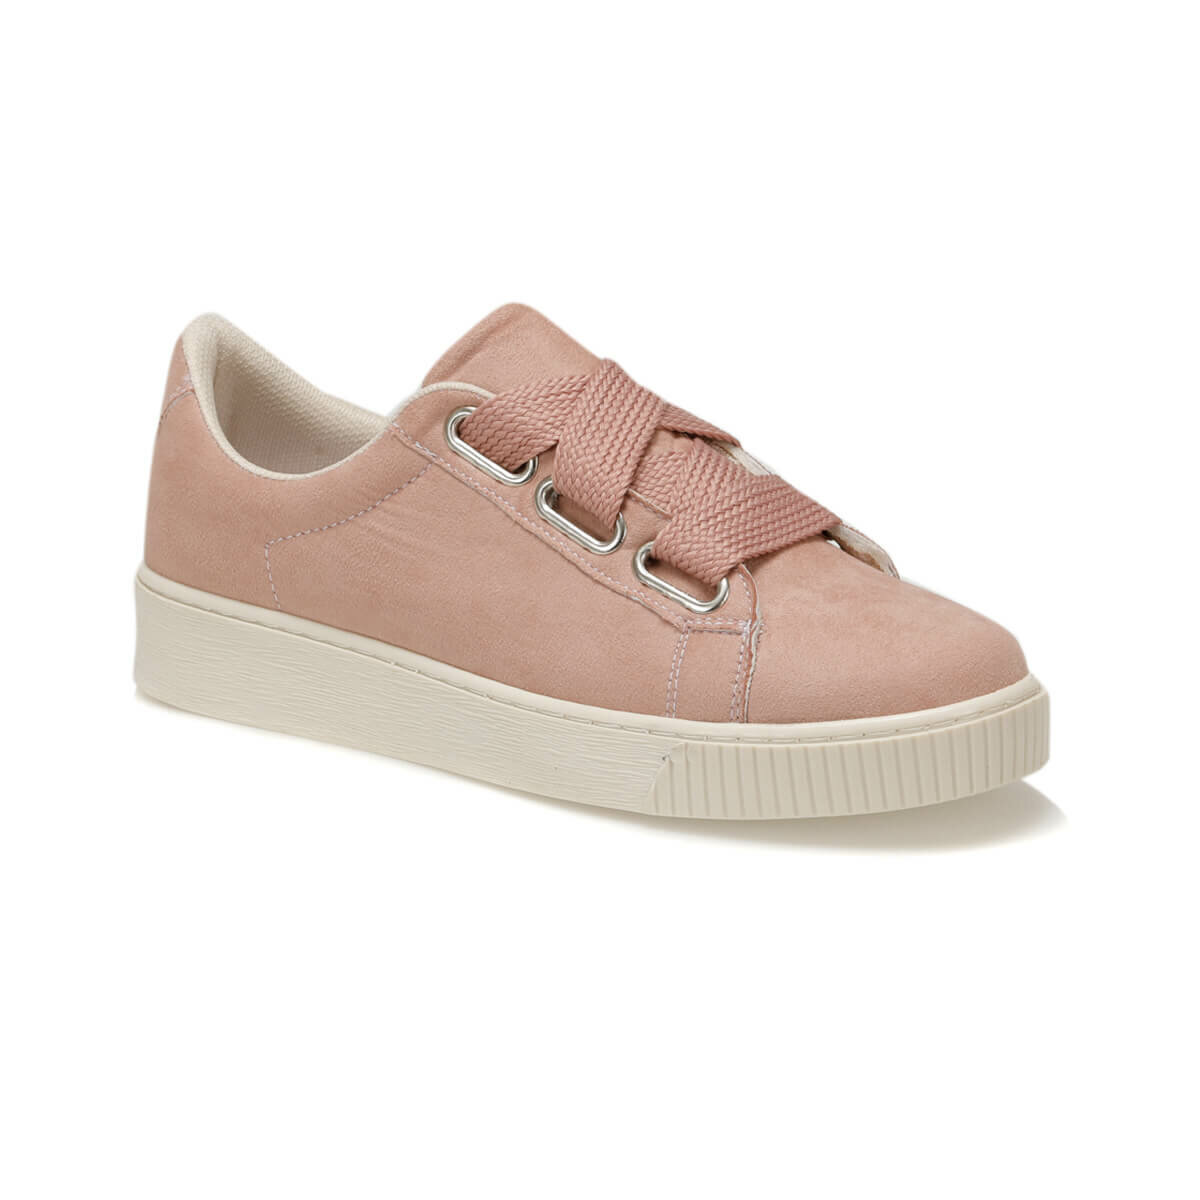 FLO CS18036-19IY Powder Women 'S Sneaker Shoes BUTIGO